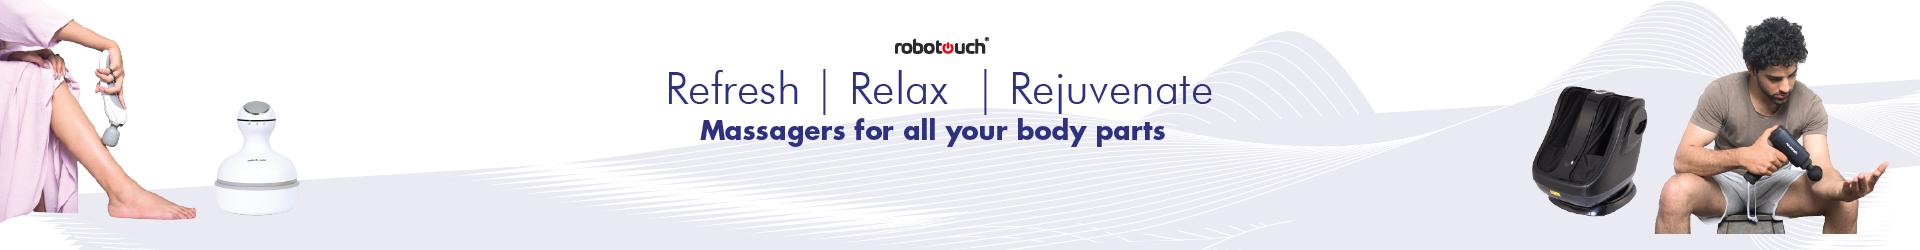 refresh-relax-rejuvenate-alessaonline